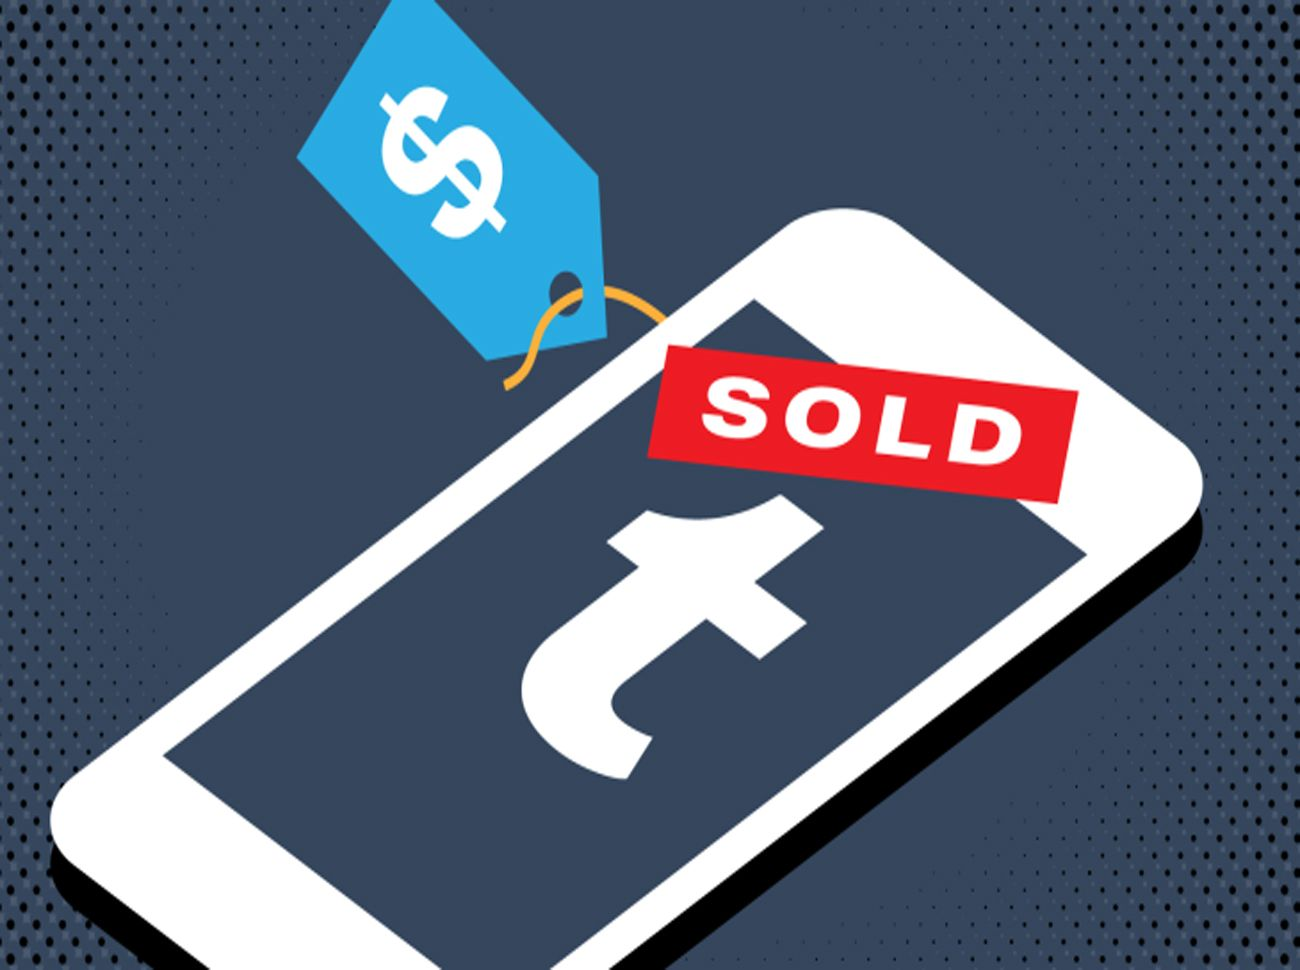 Tumblr 3 Milyon Dolara Automattic'e Satıldı